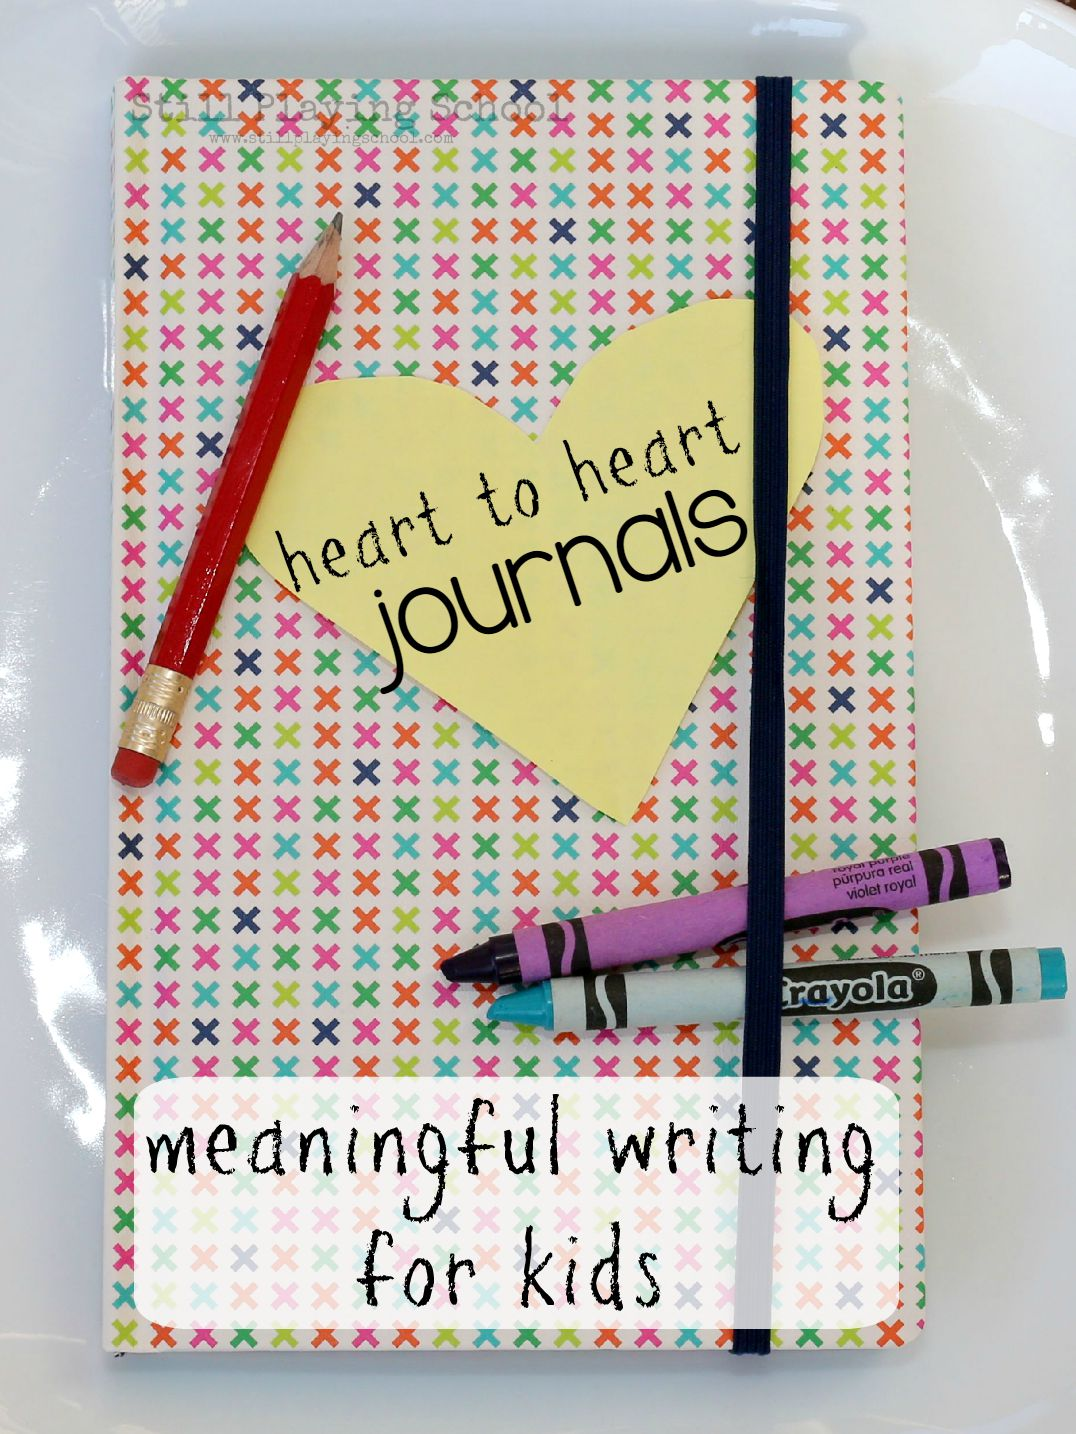 Heart To Heart Journals